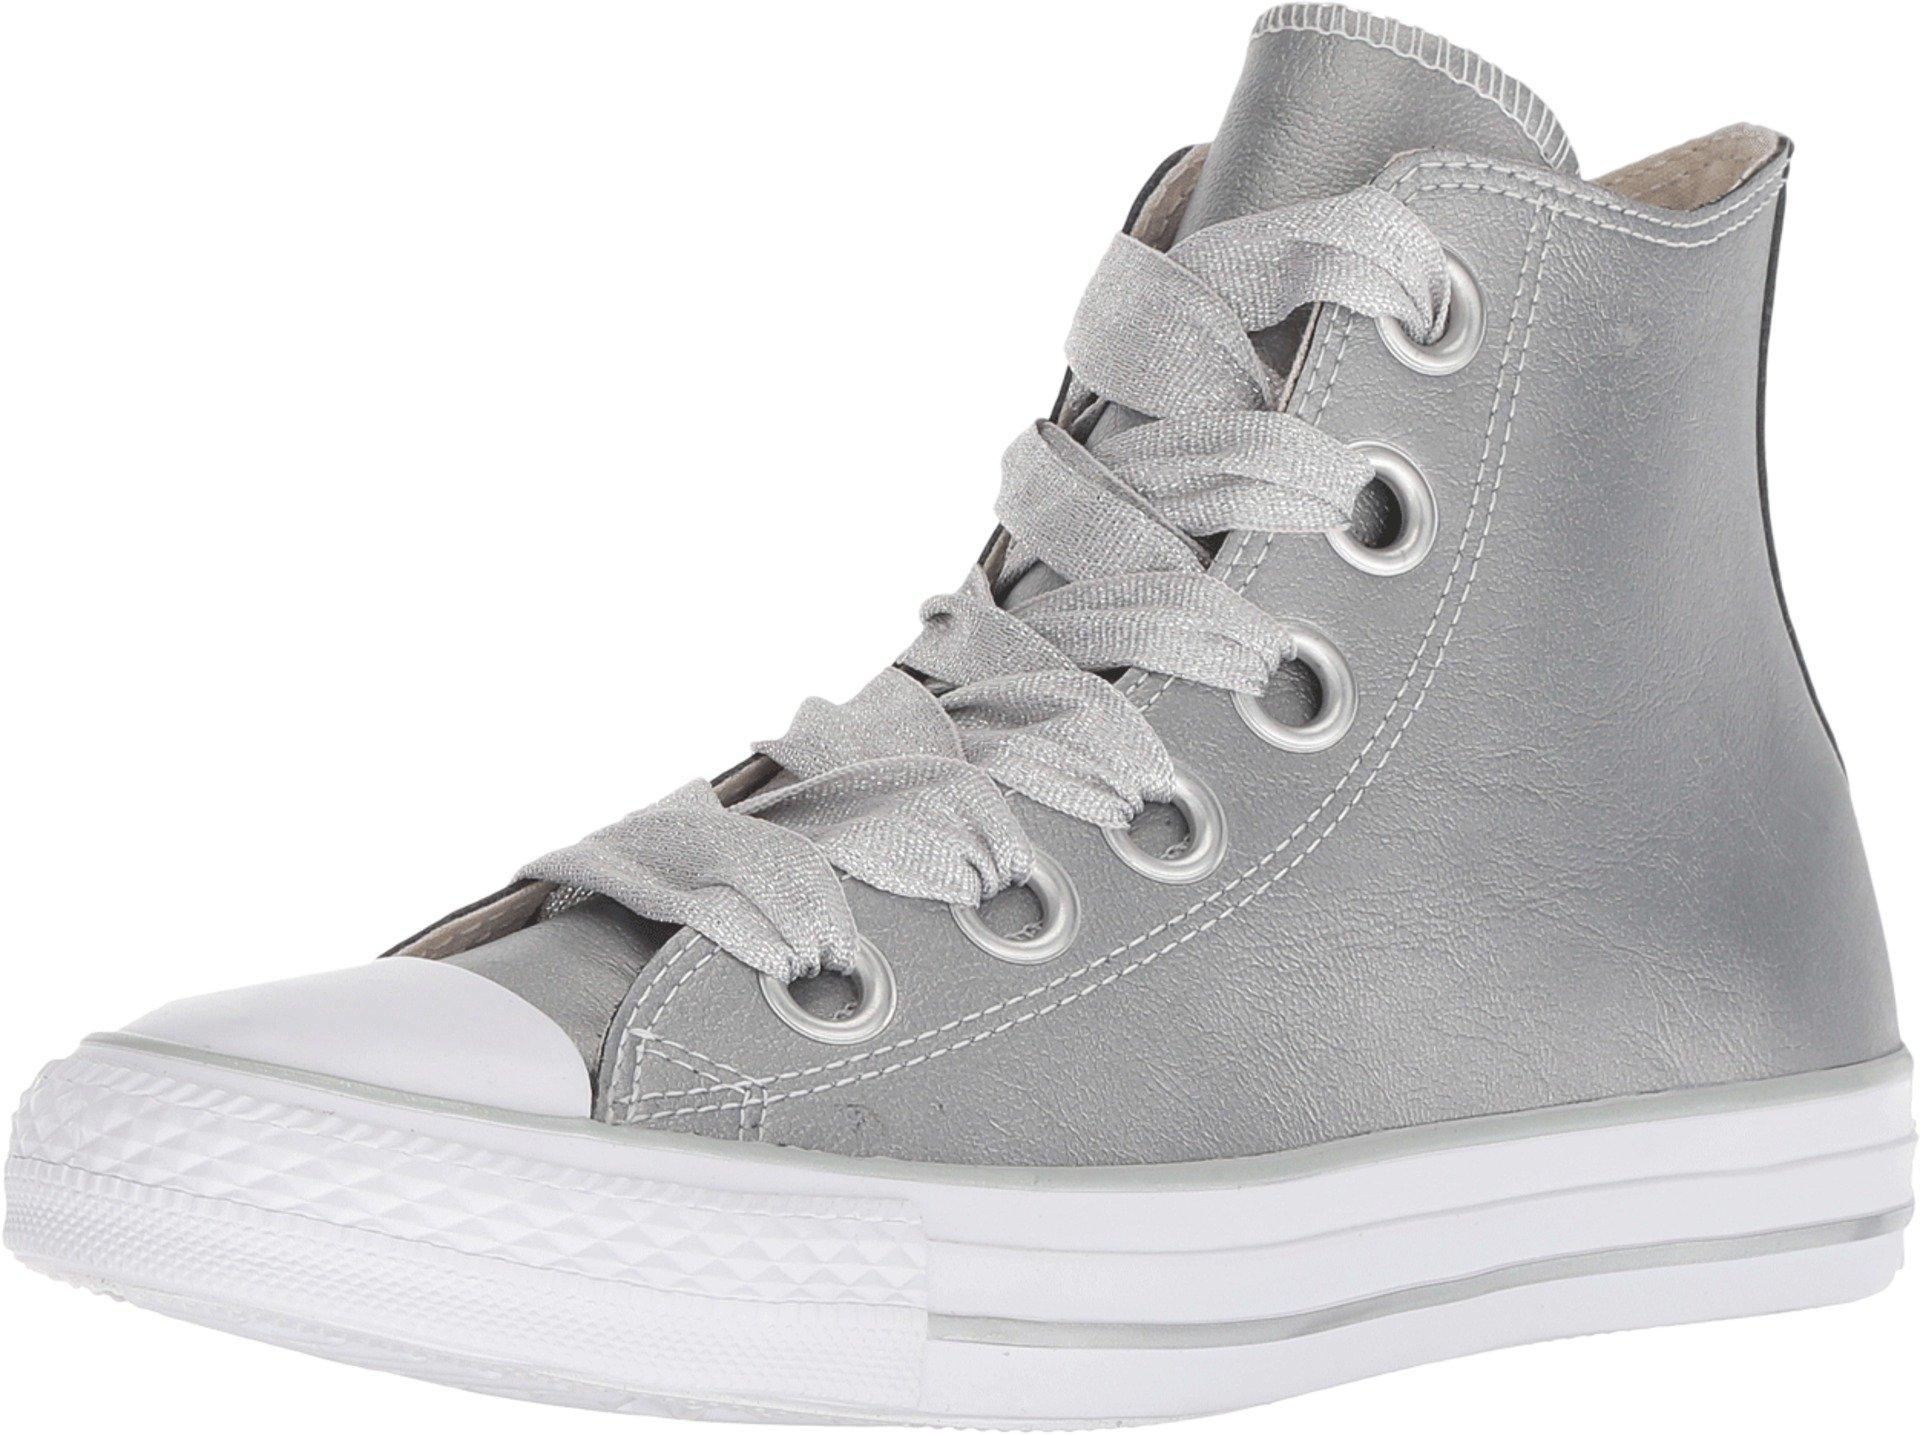 Converse Womens Chuck Taylor All Star Big Eyelets-Ox Low-Top Metallic Silver Sneaker - 6